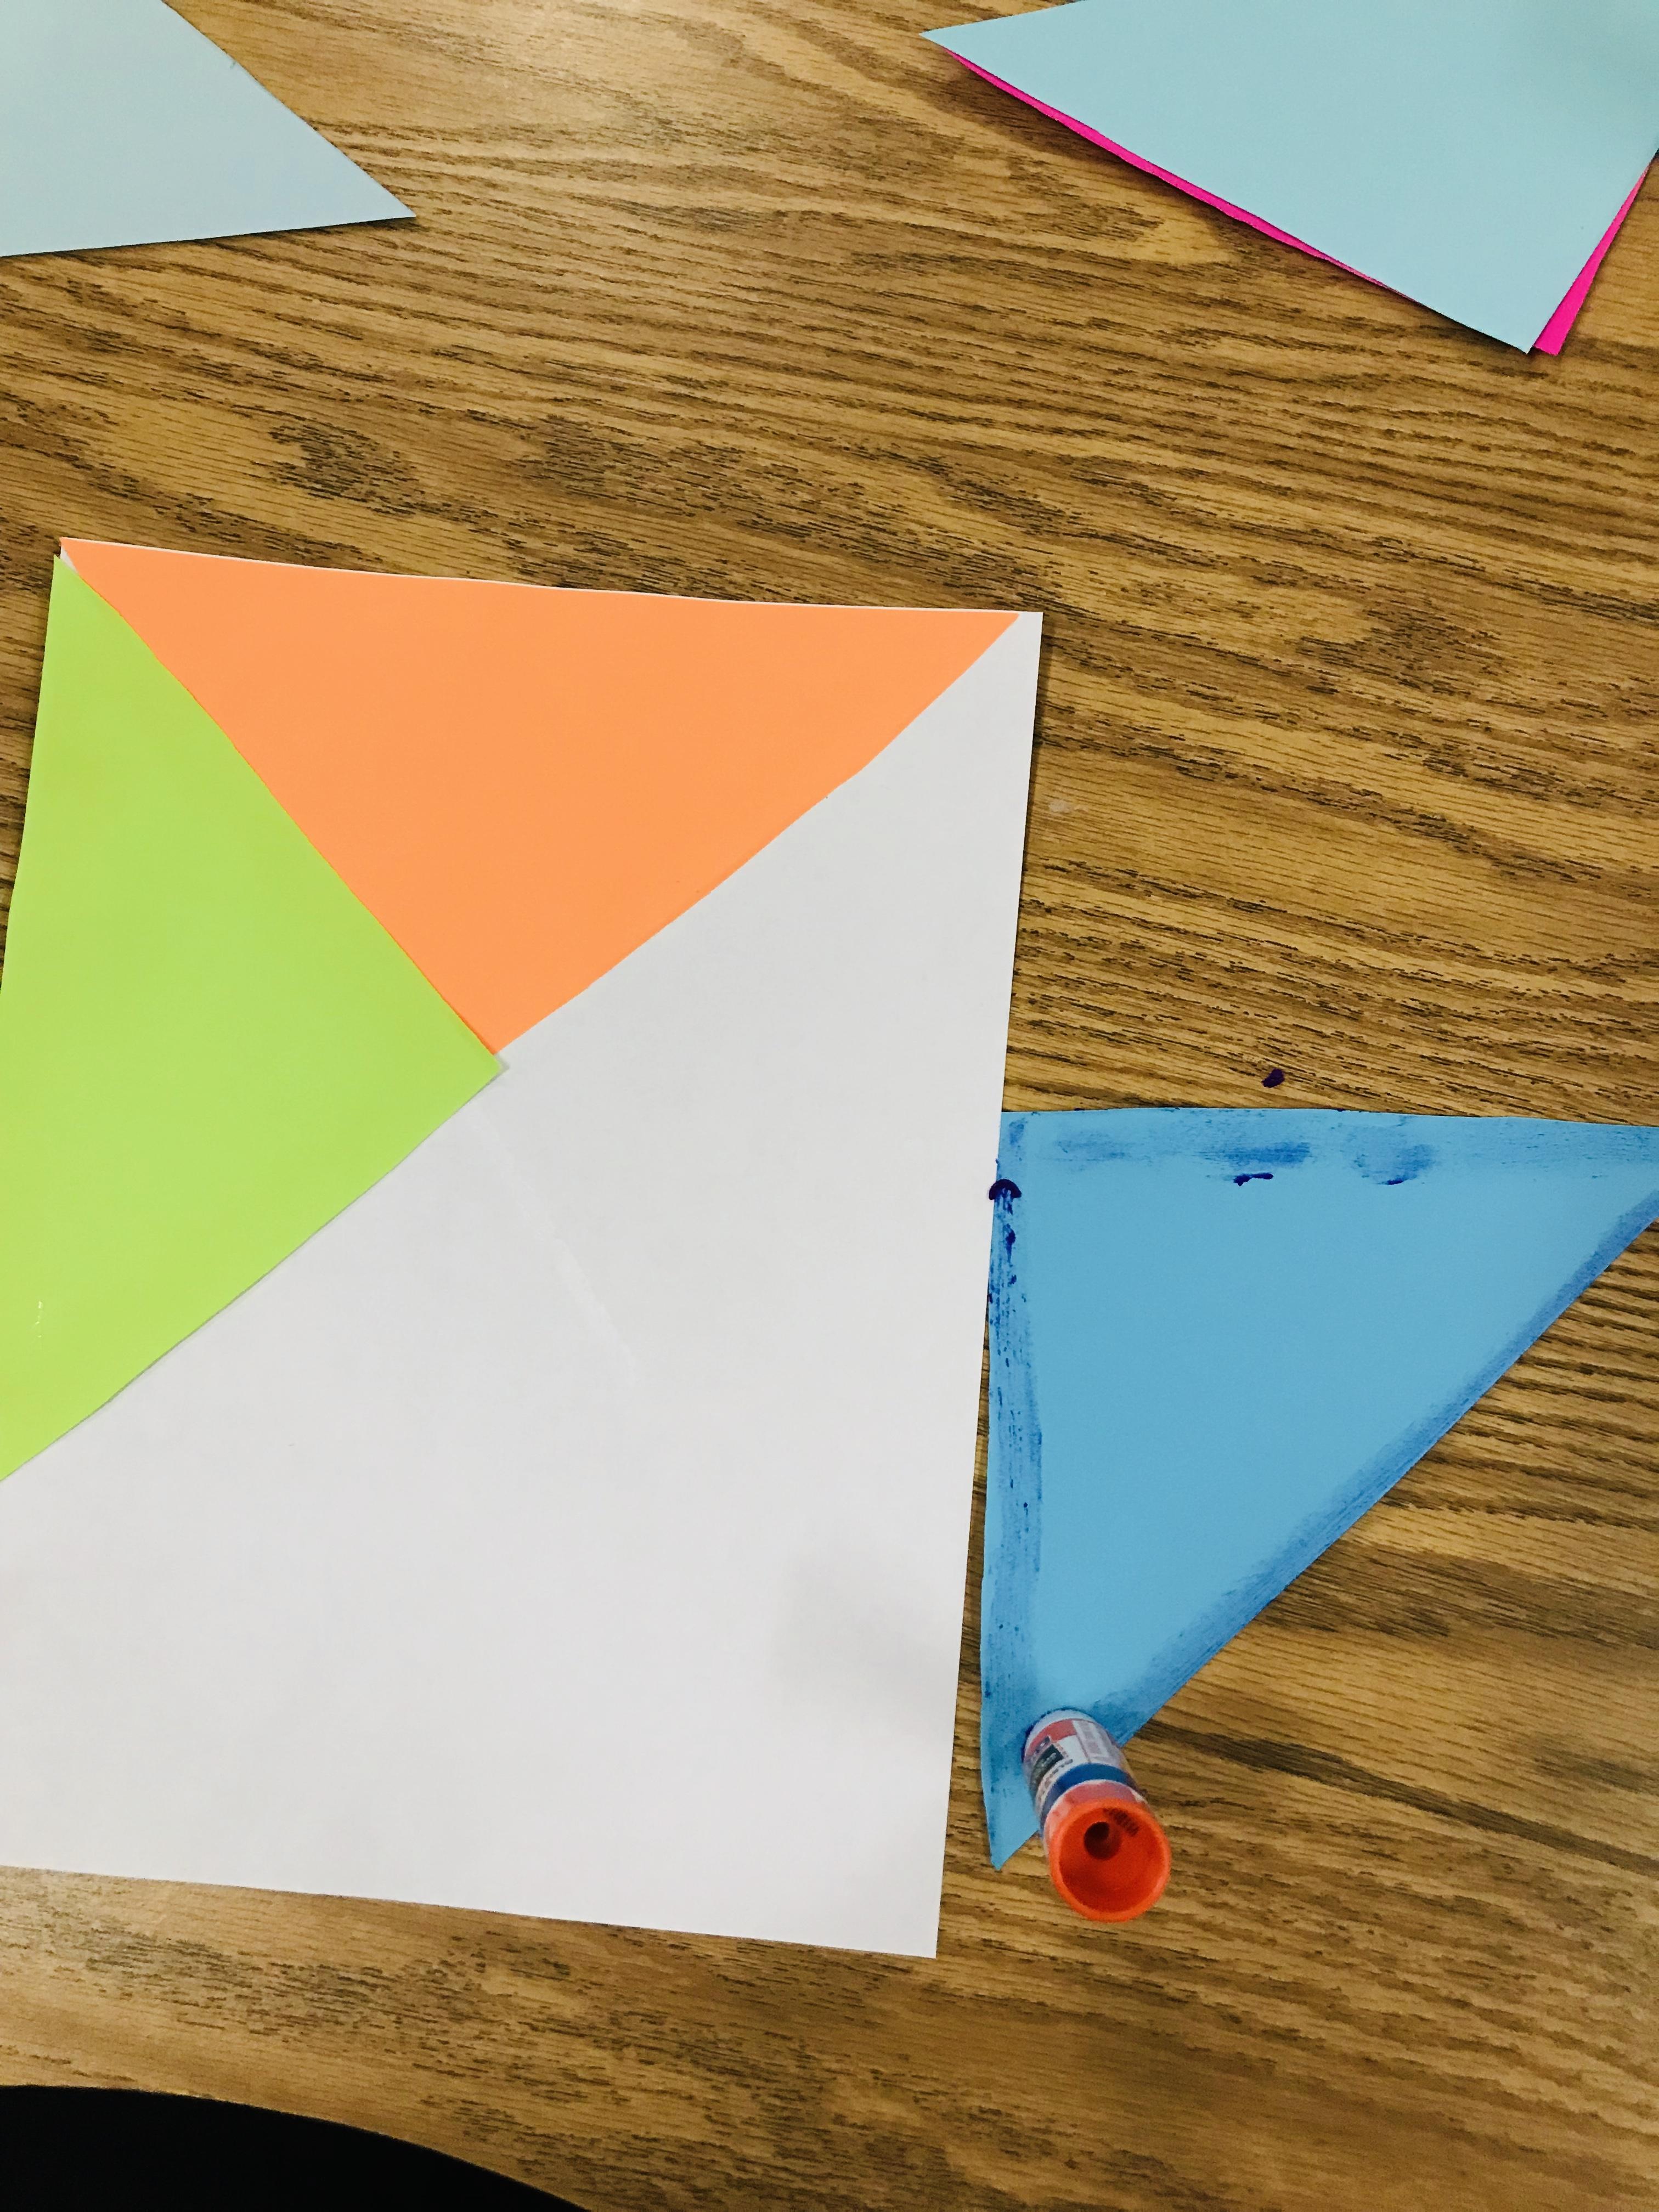 Gluing paper quilt